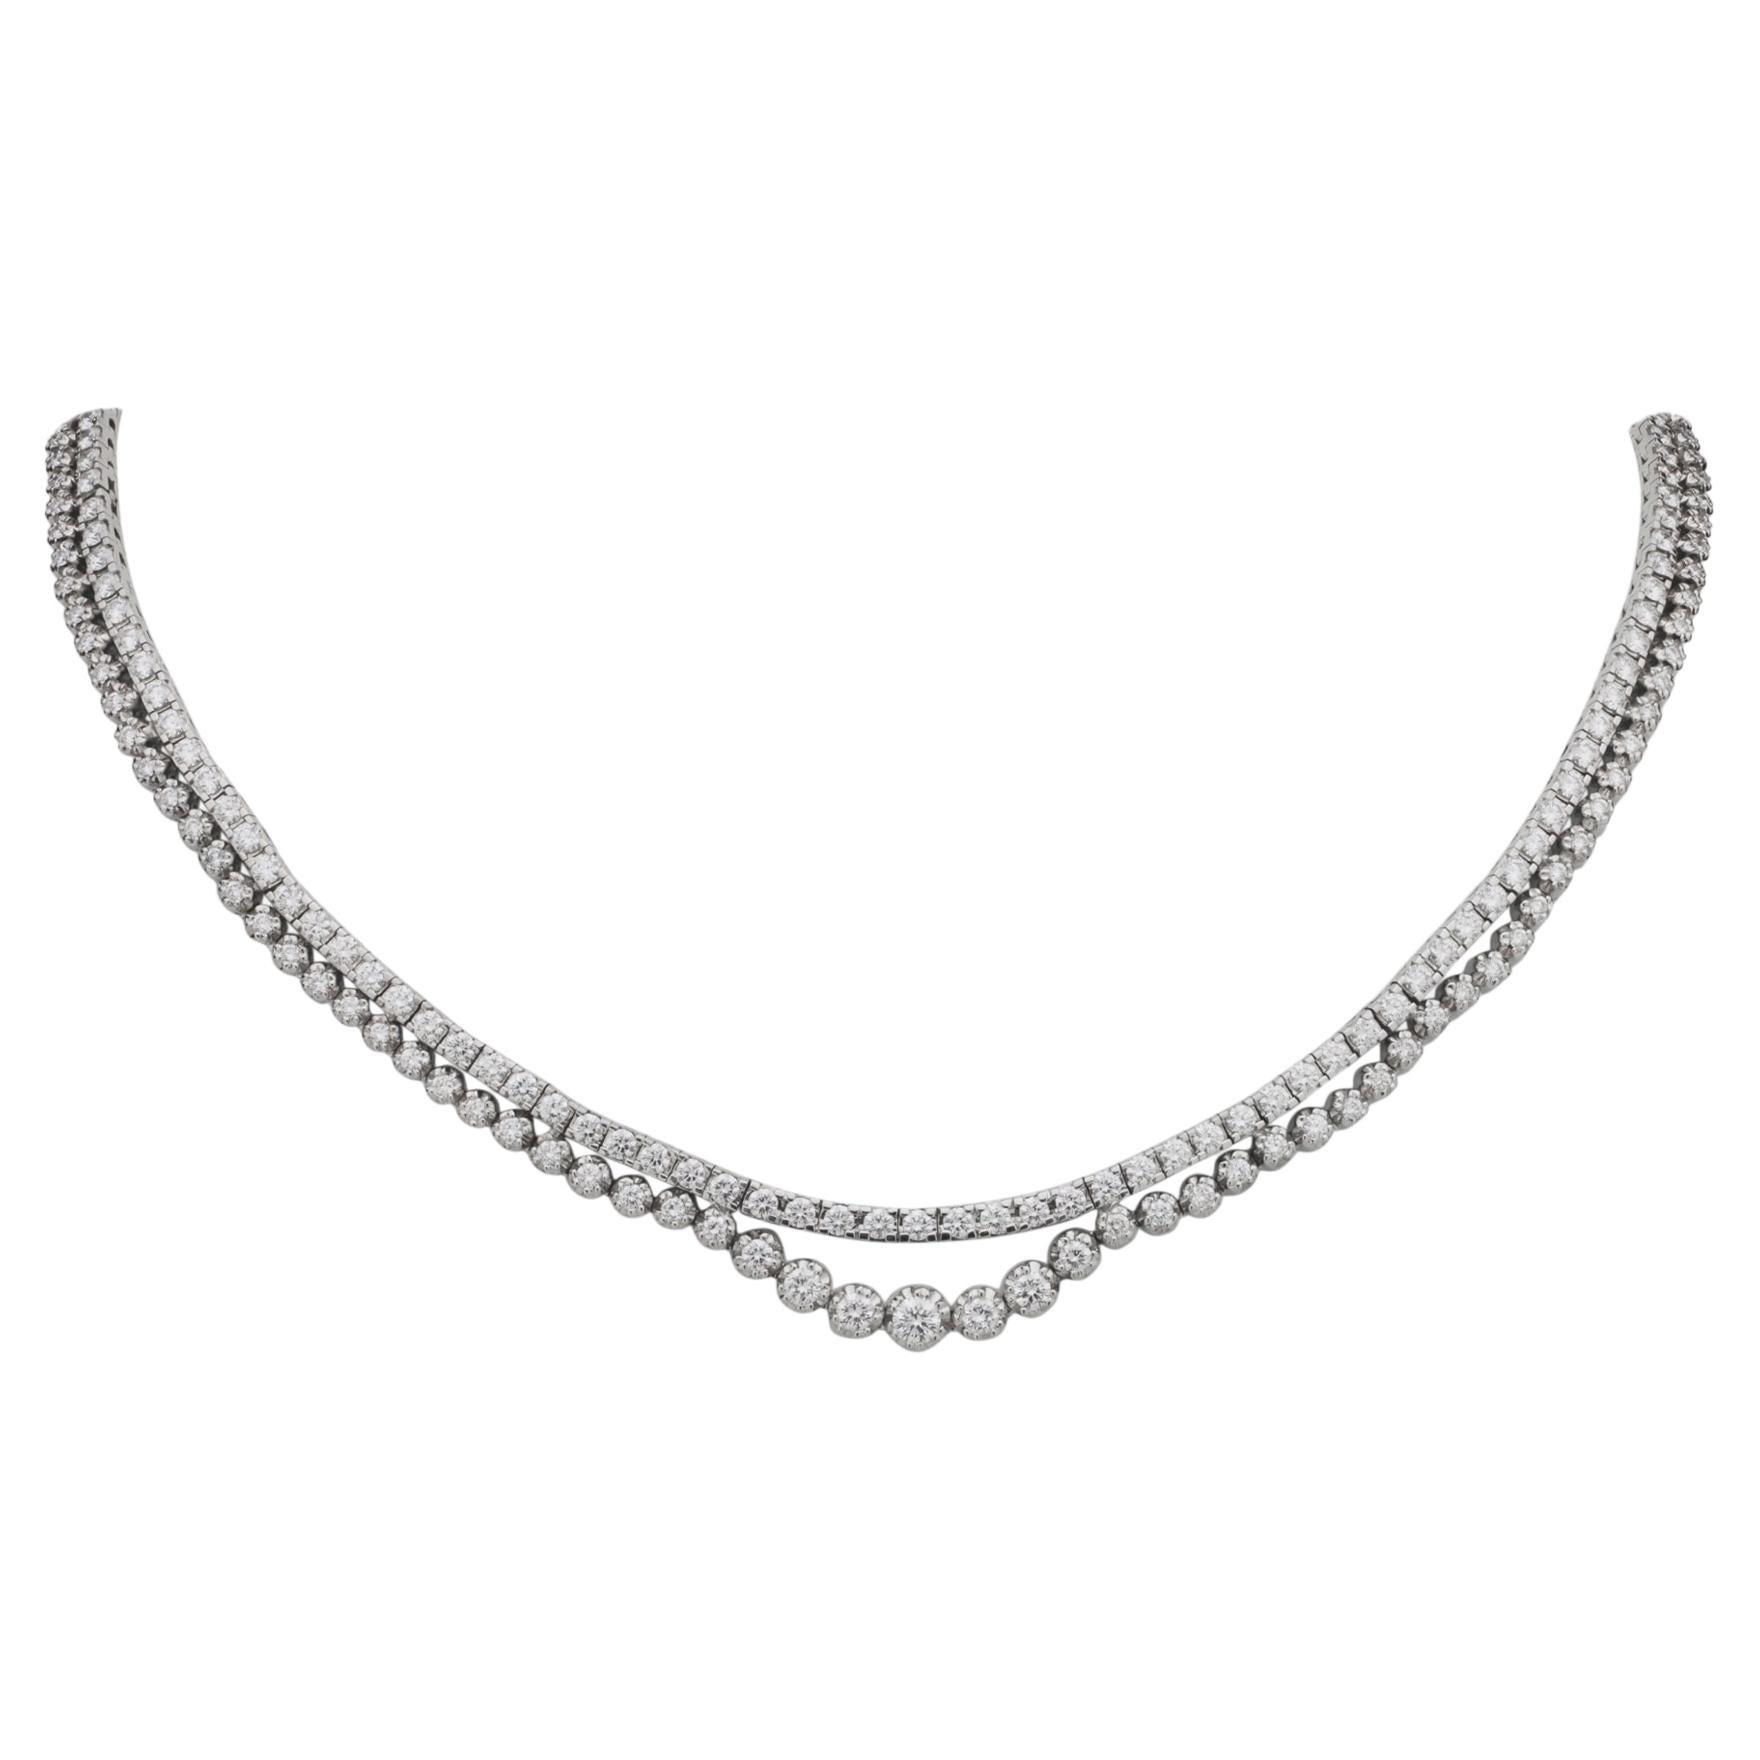 Fine 18 Karat White Gold and Diamond Riviere Necklace